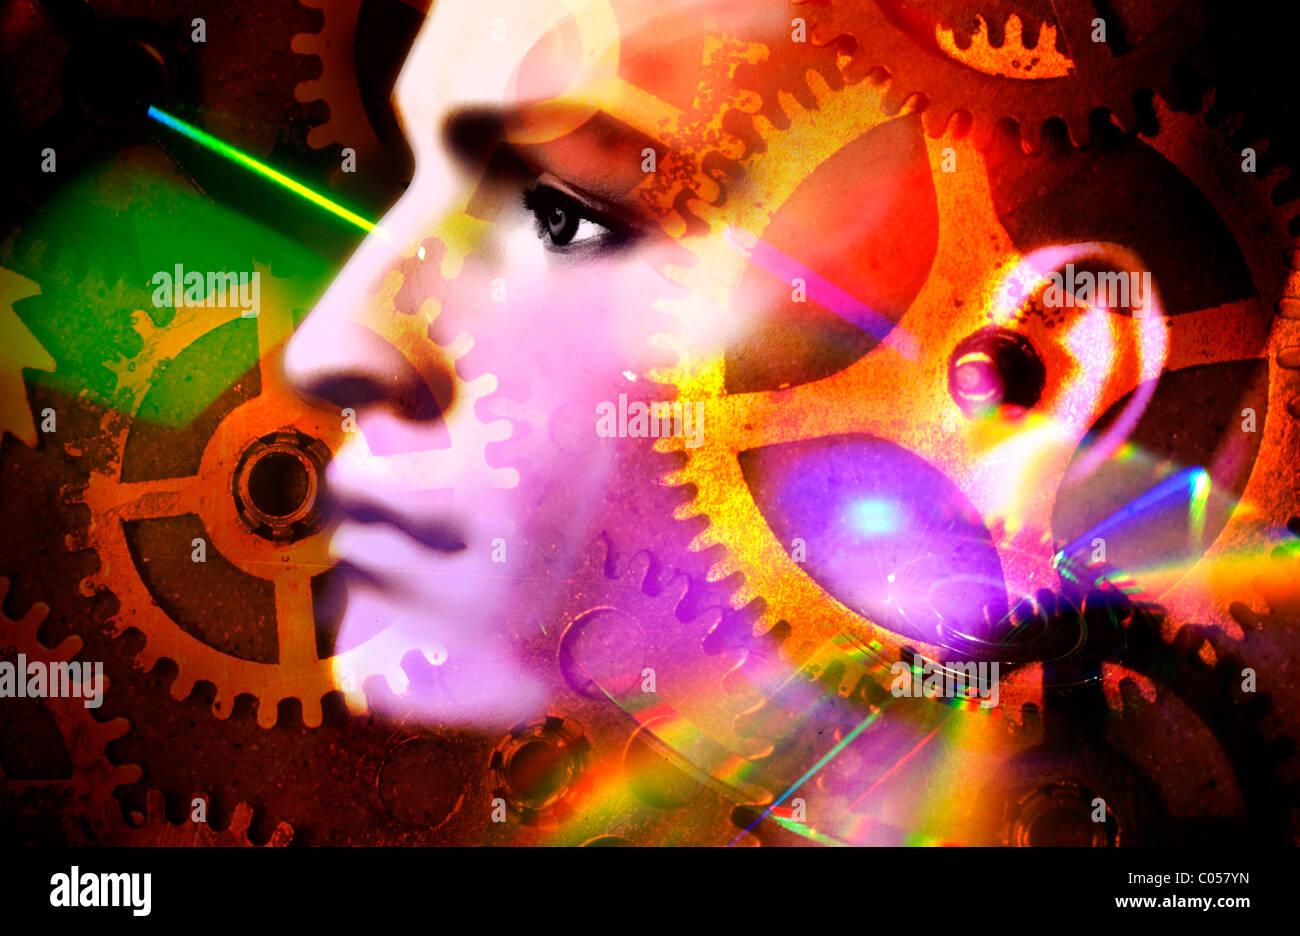 Denken, geistige Gesundheit, Gedanken, Psychologie, Ideen Konzept Stockbild